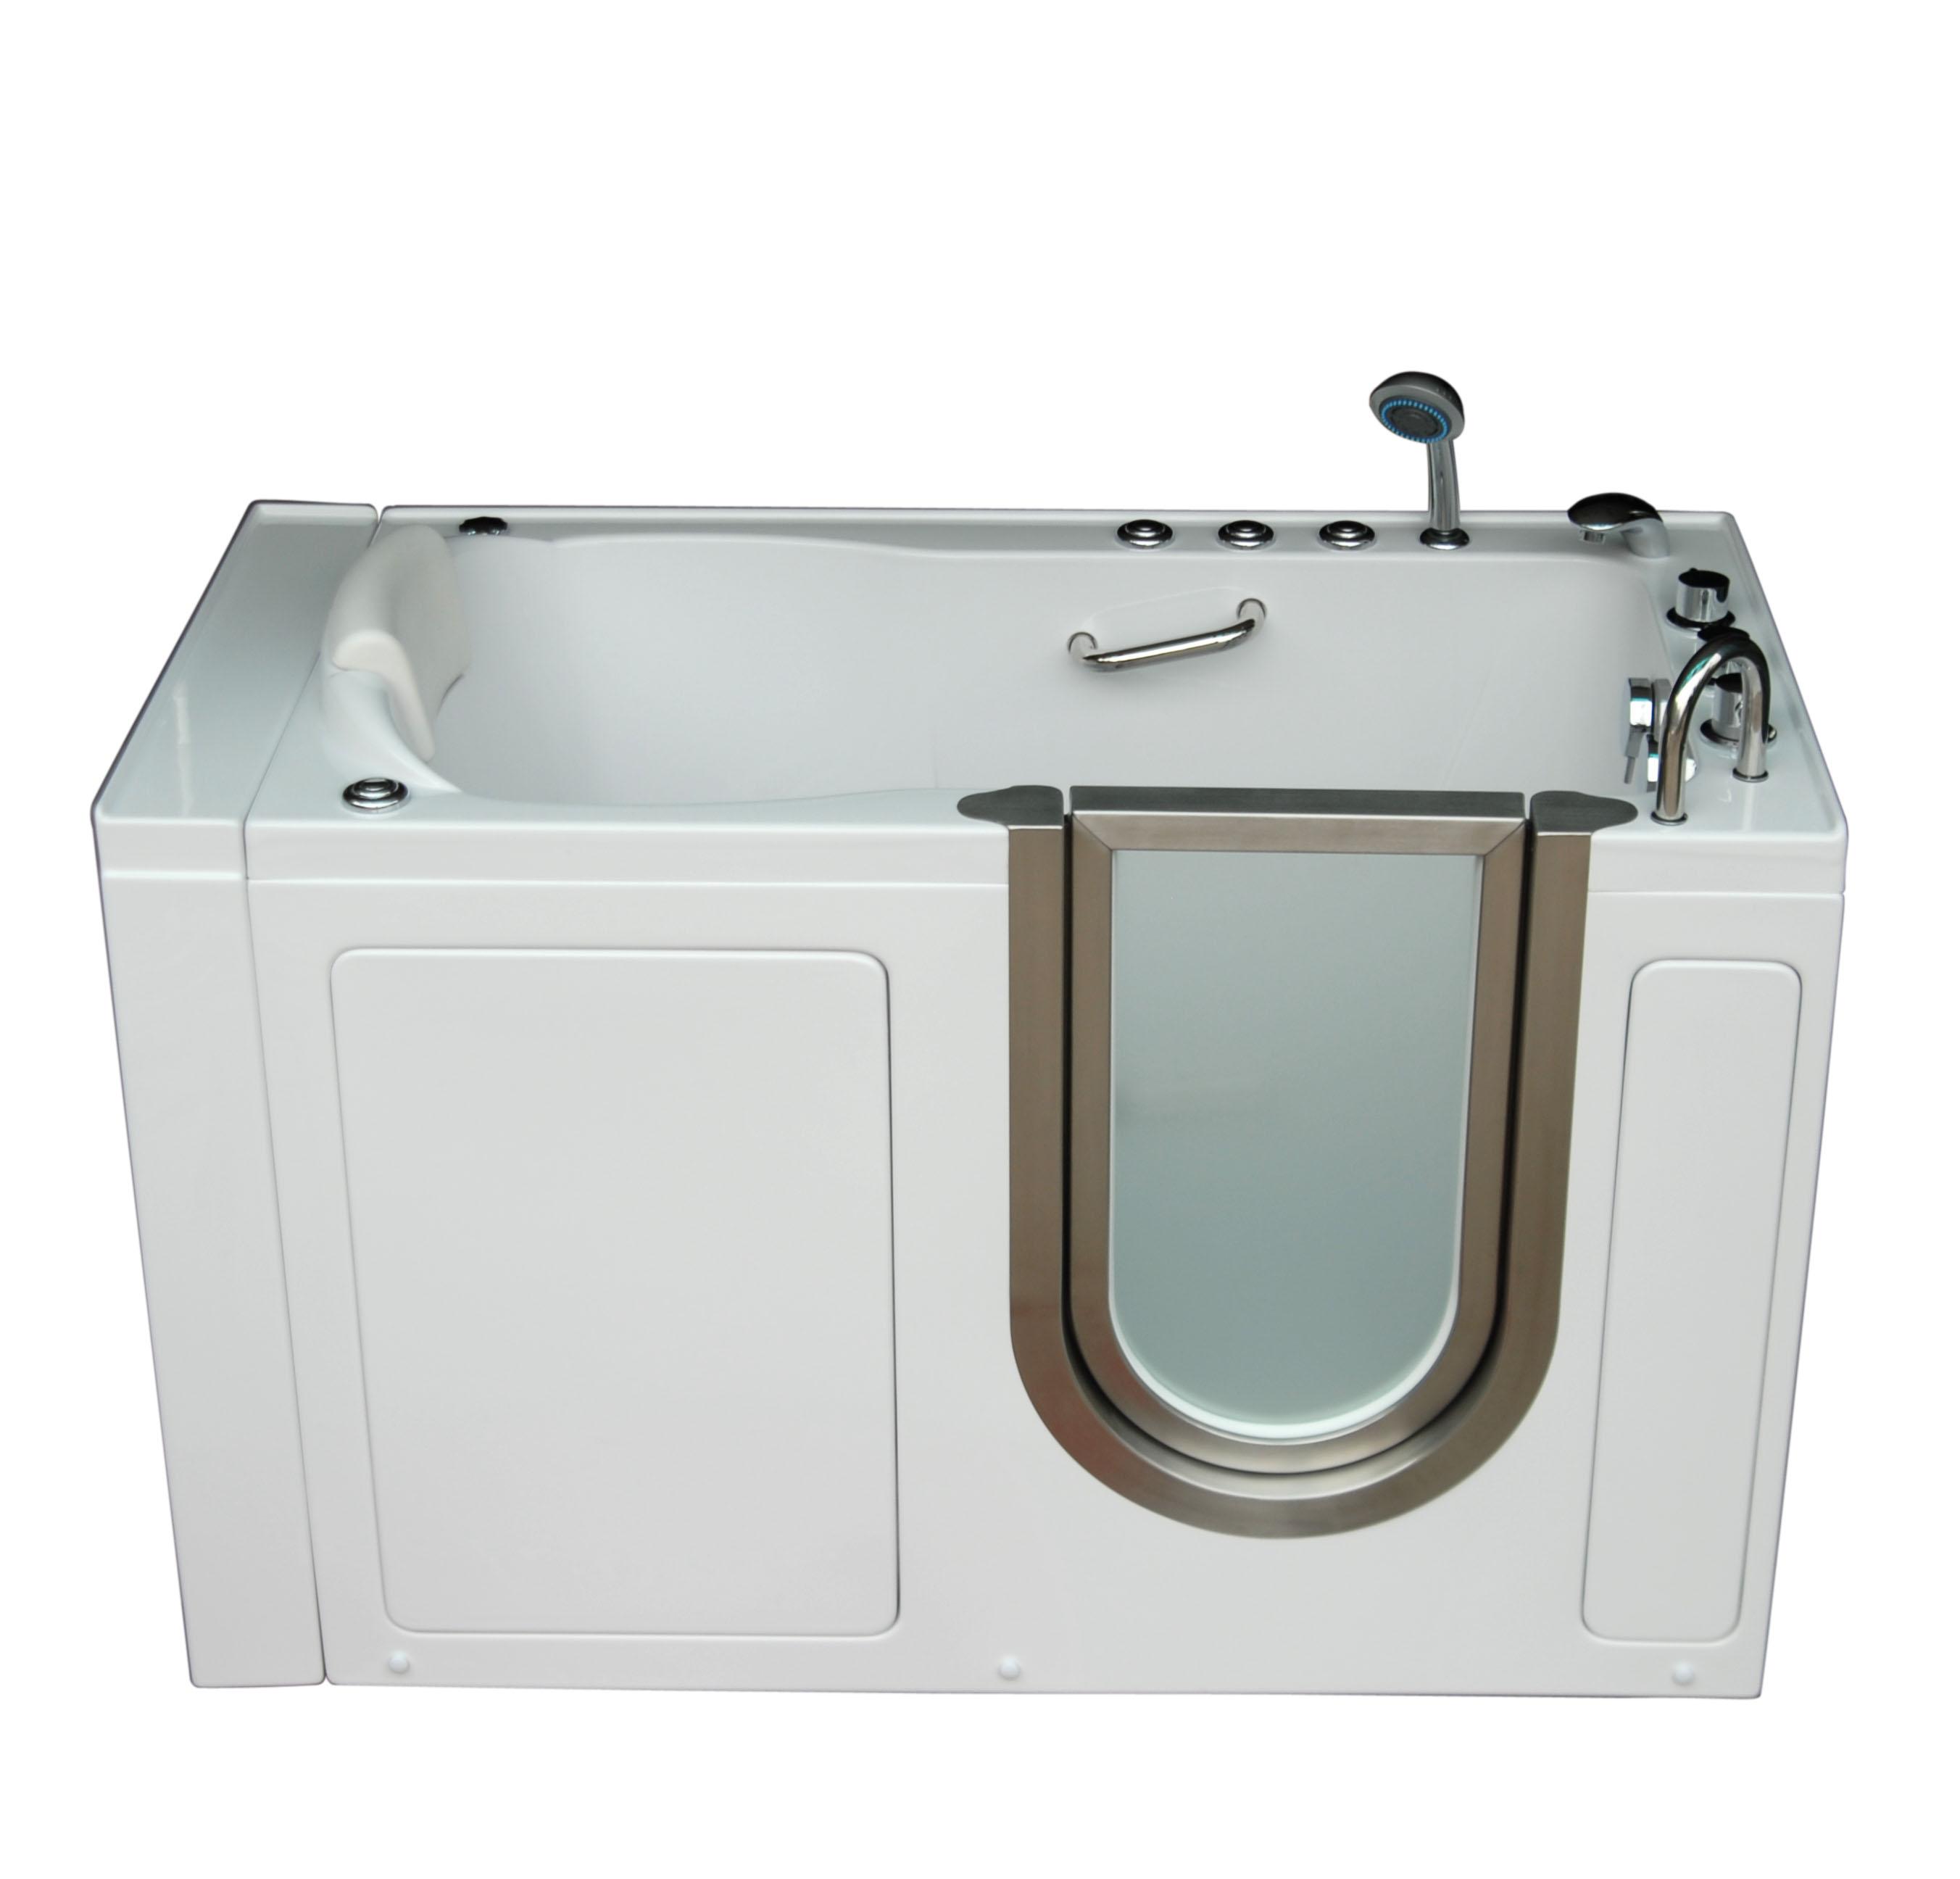 Compact Walk In Tubs Model Bathtub For Seniors Amp